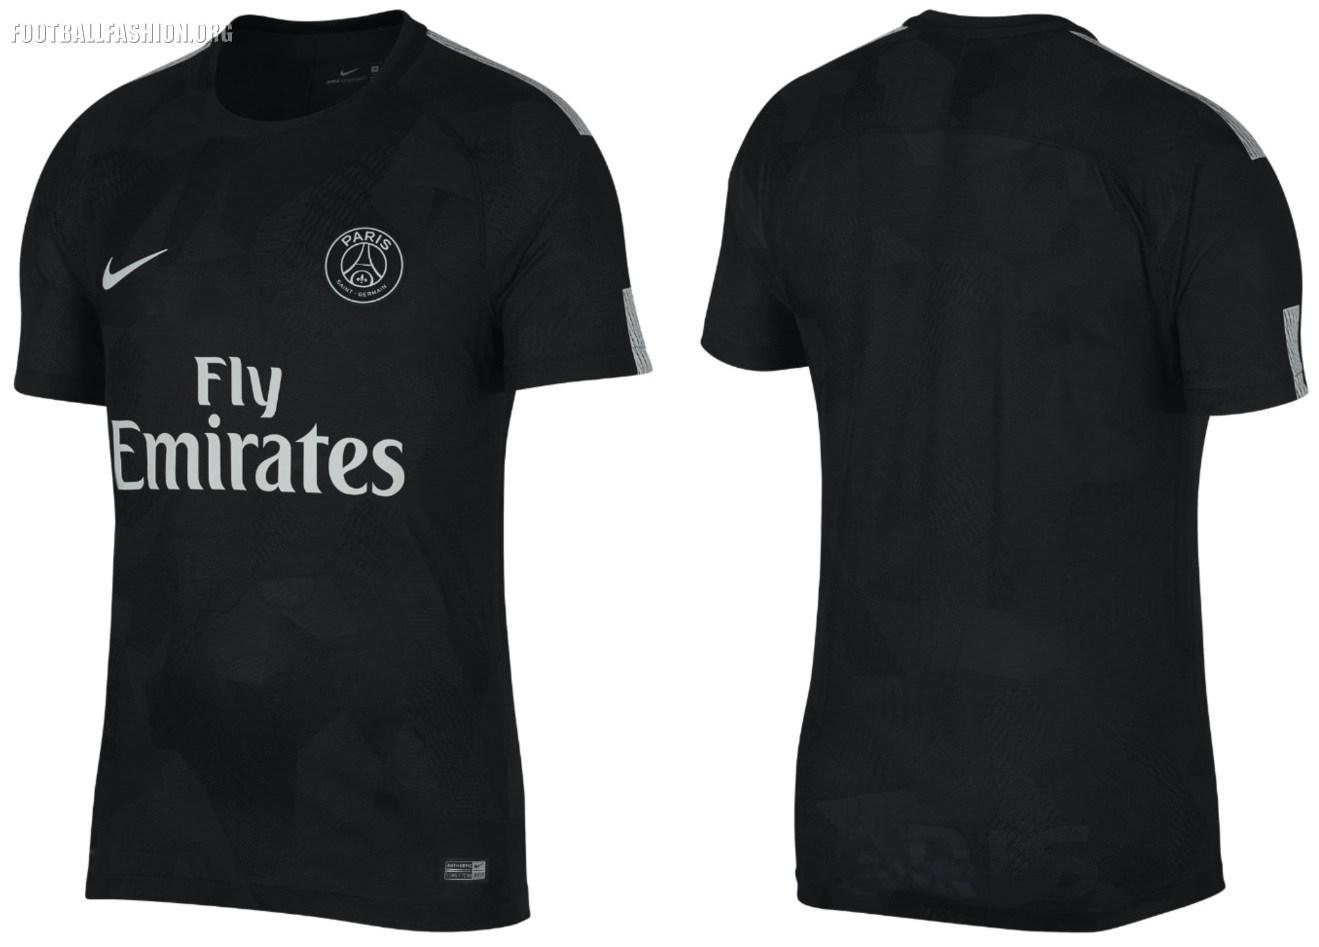 Rp80.000Kiara fashion - Jersey Bola Shirt Jersey Home away third PSG Ukuran S M L XL Elegant Murah